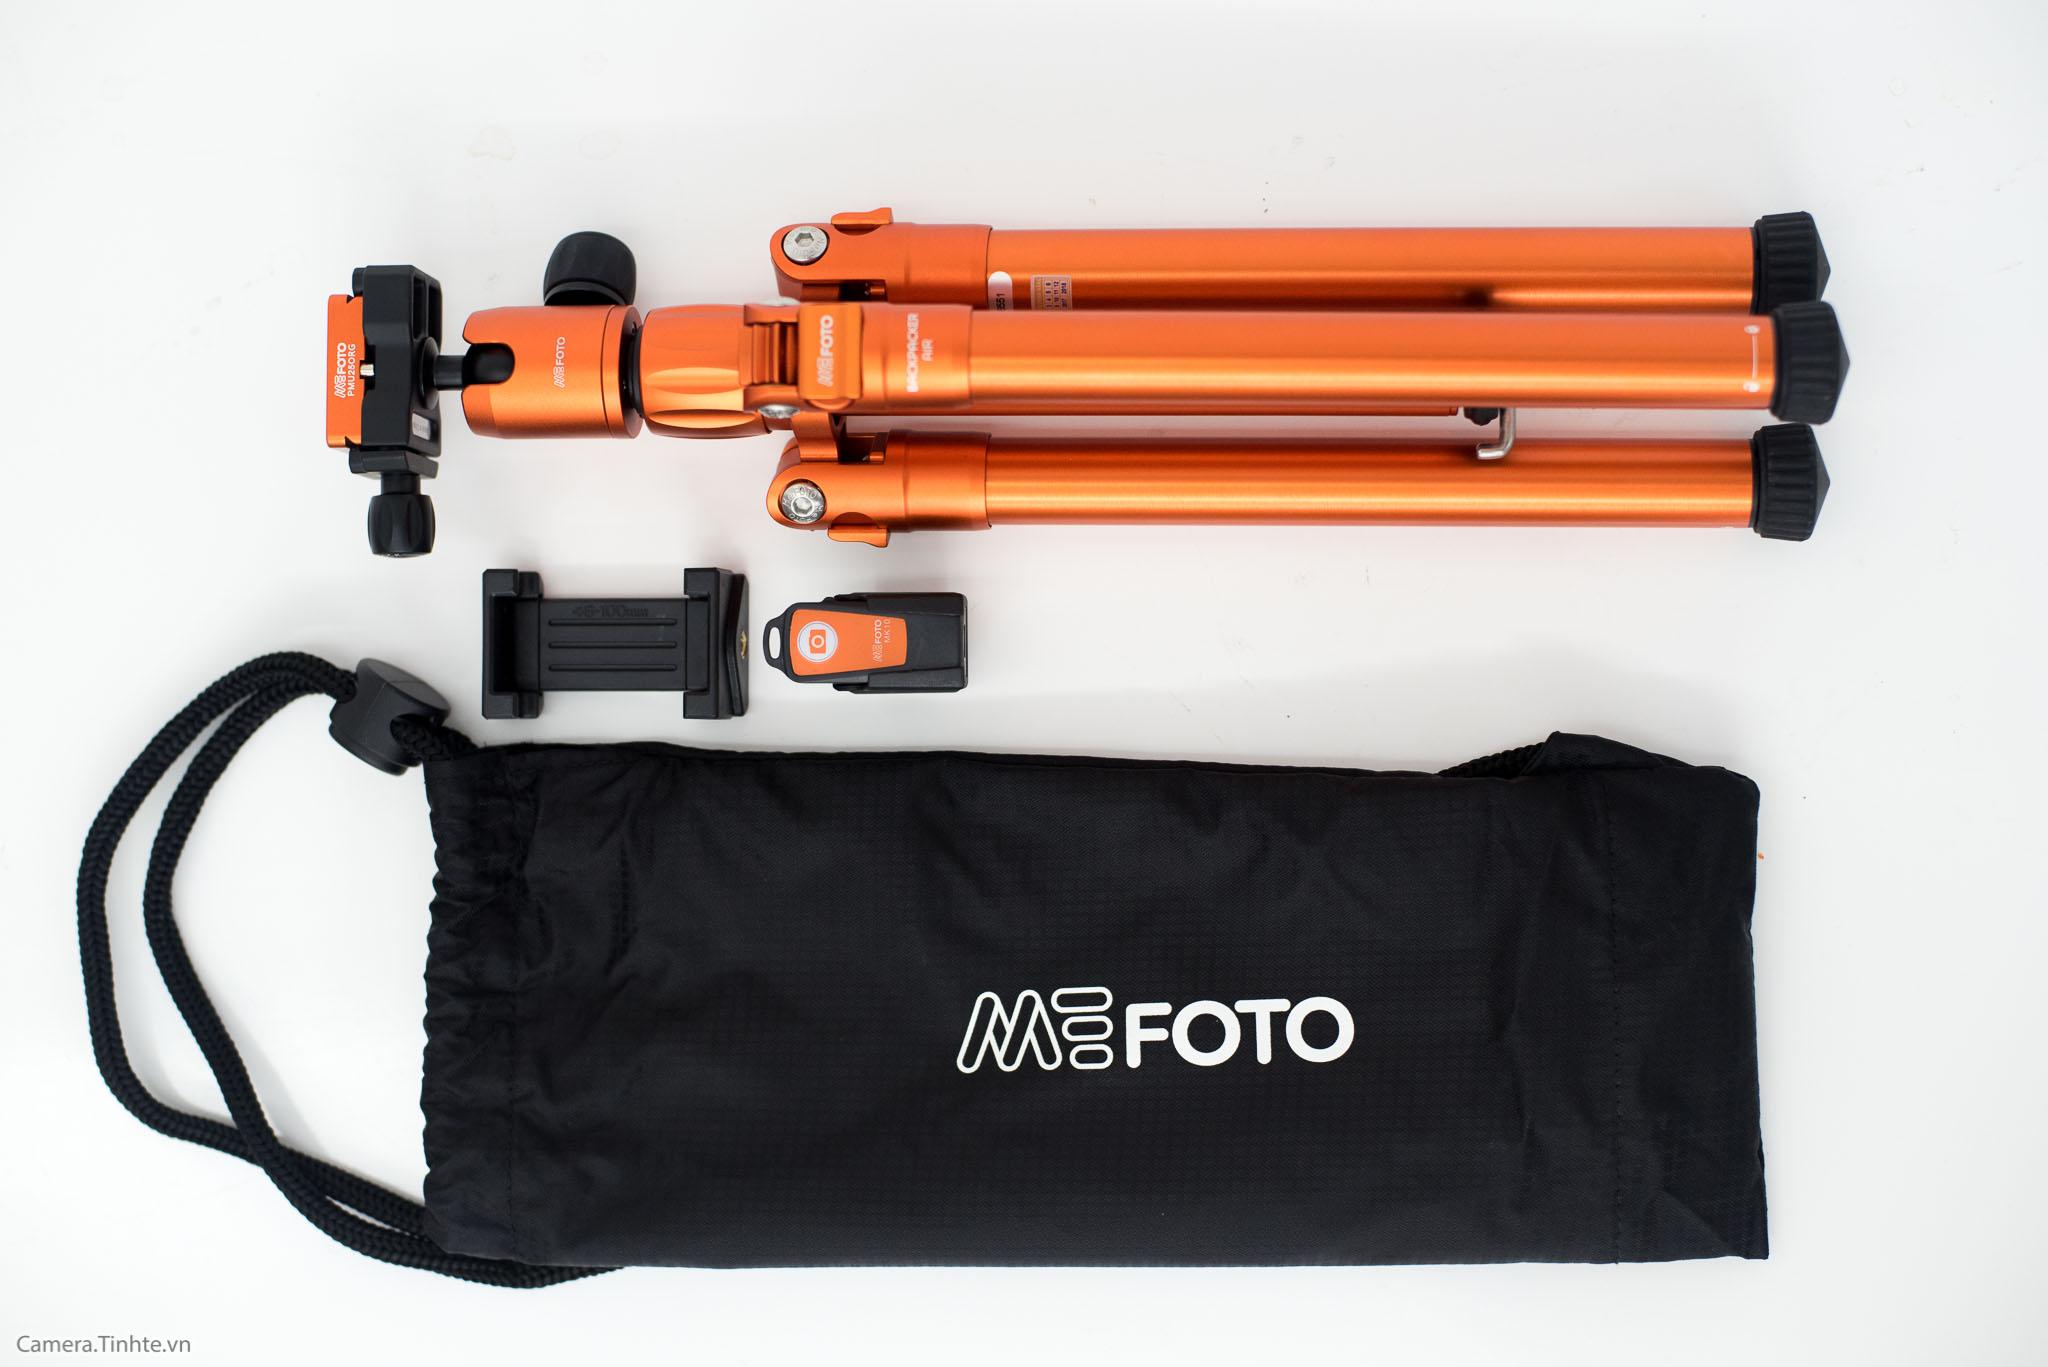 Tren tay tripod Mefoto Backpacker AIR - Camera.tinhte.vn-20.jpg